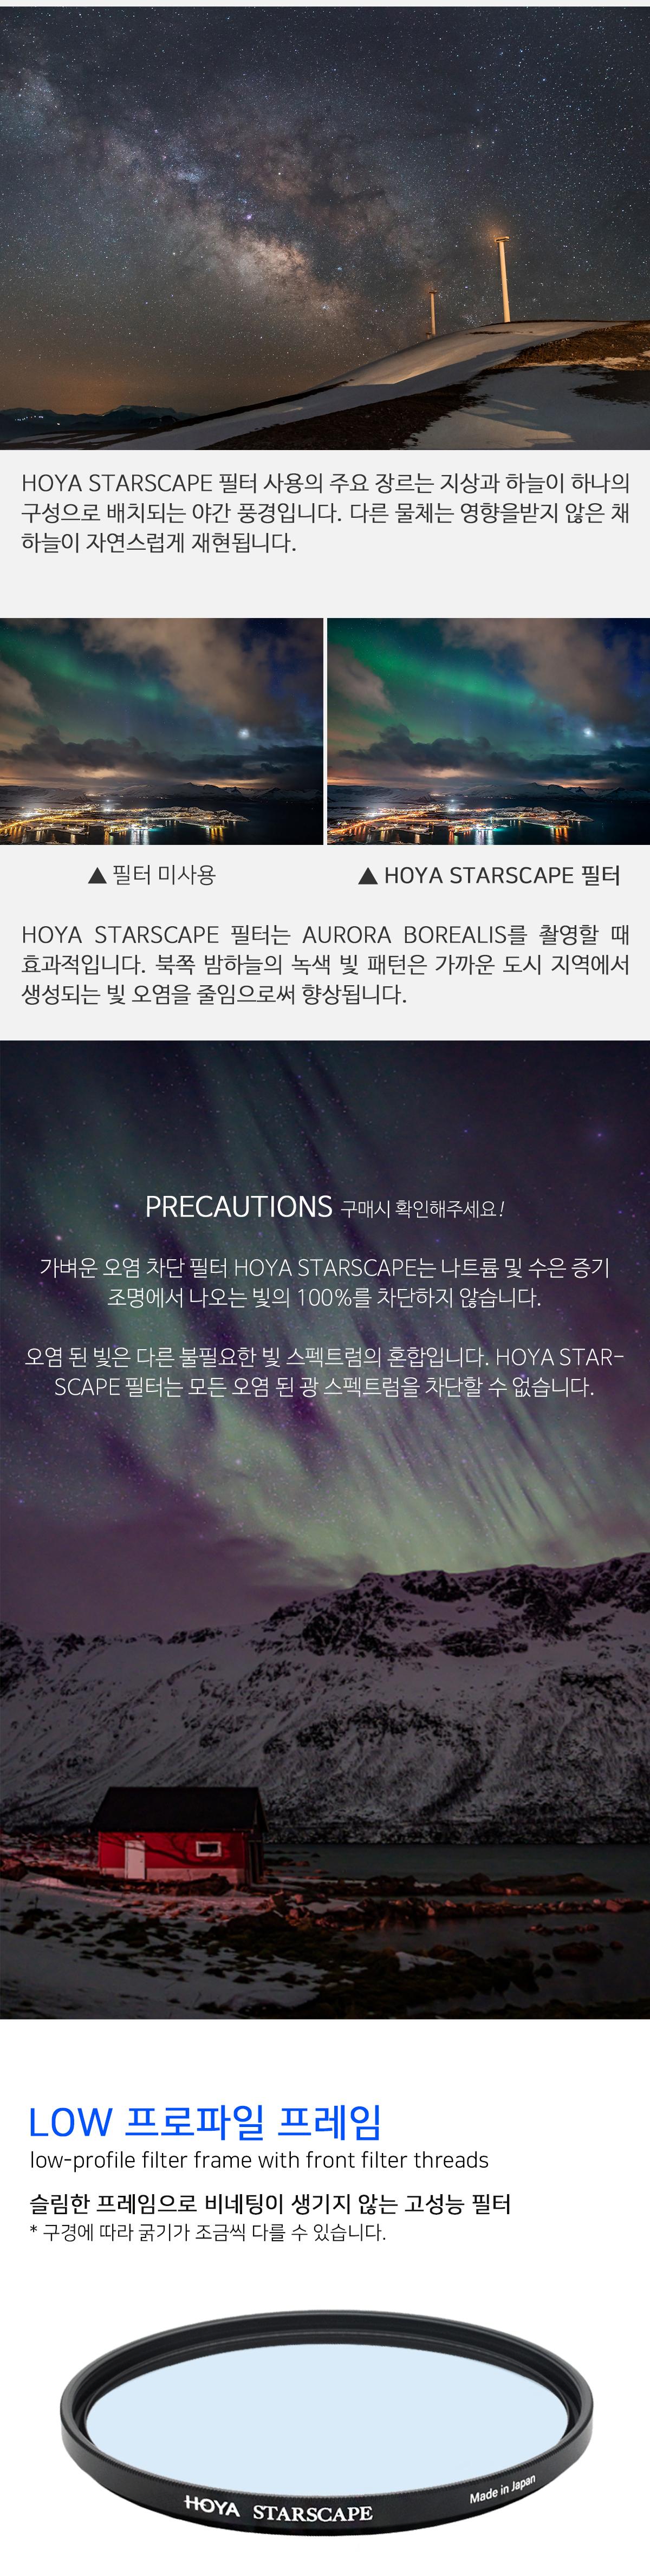 STARSCAPE_3.jpg